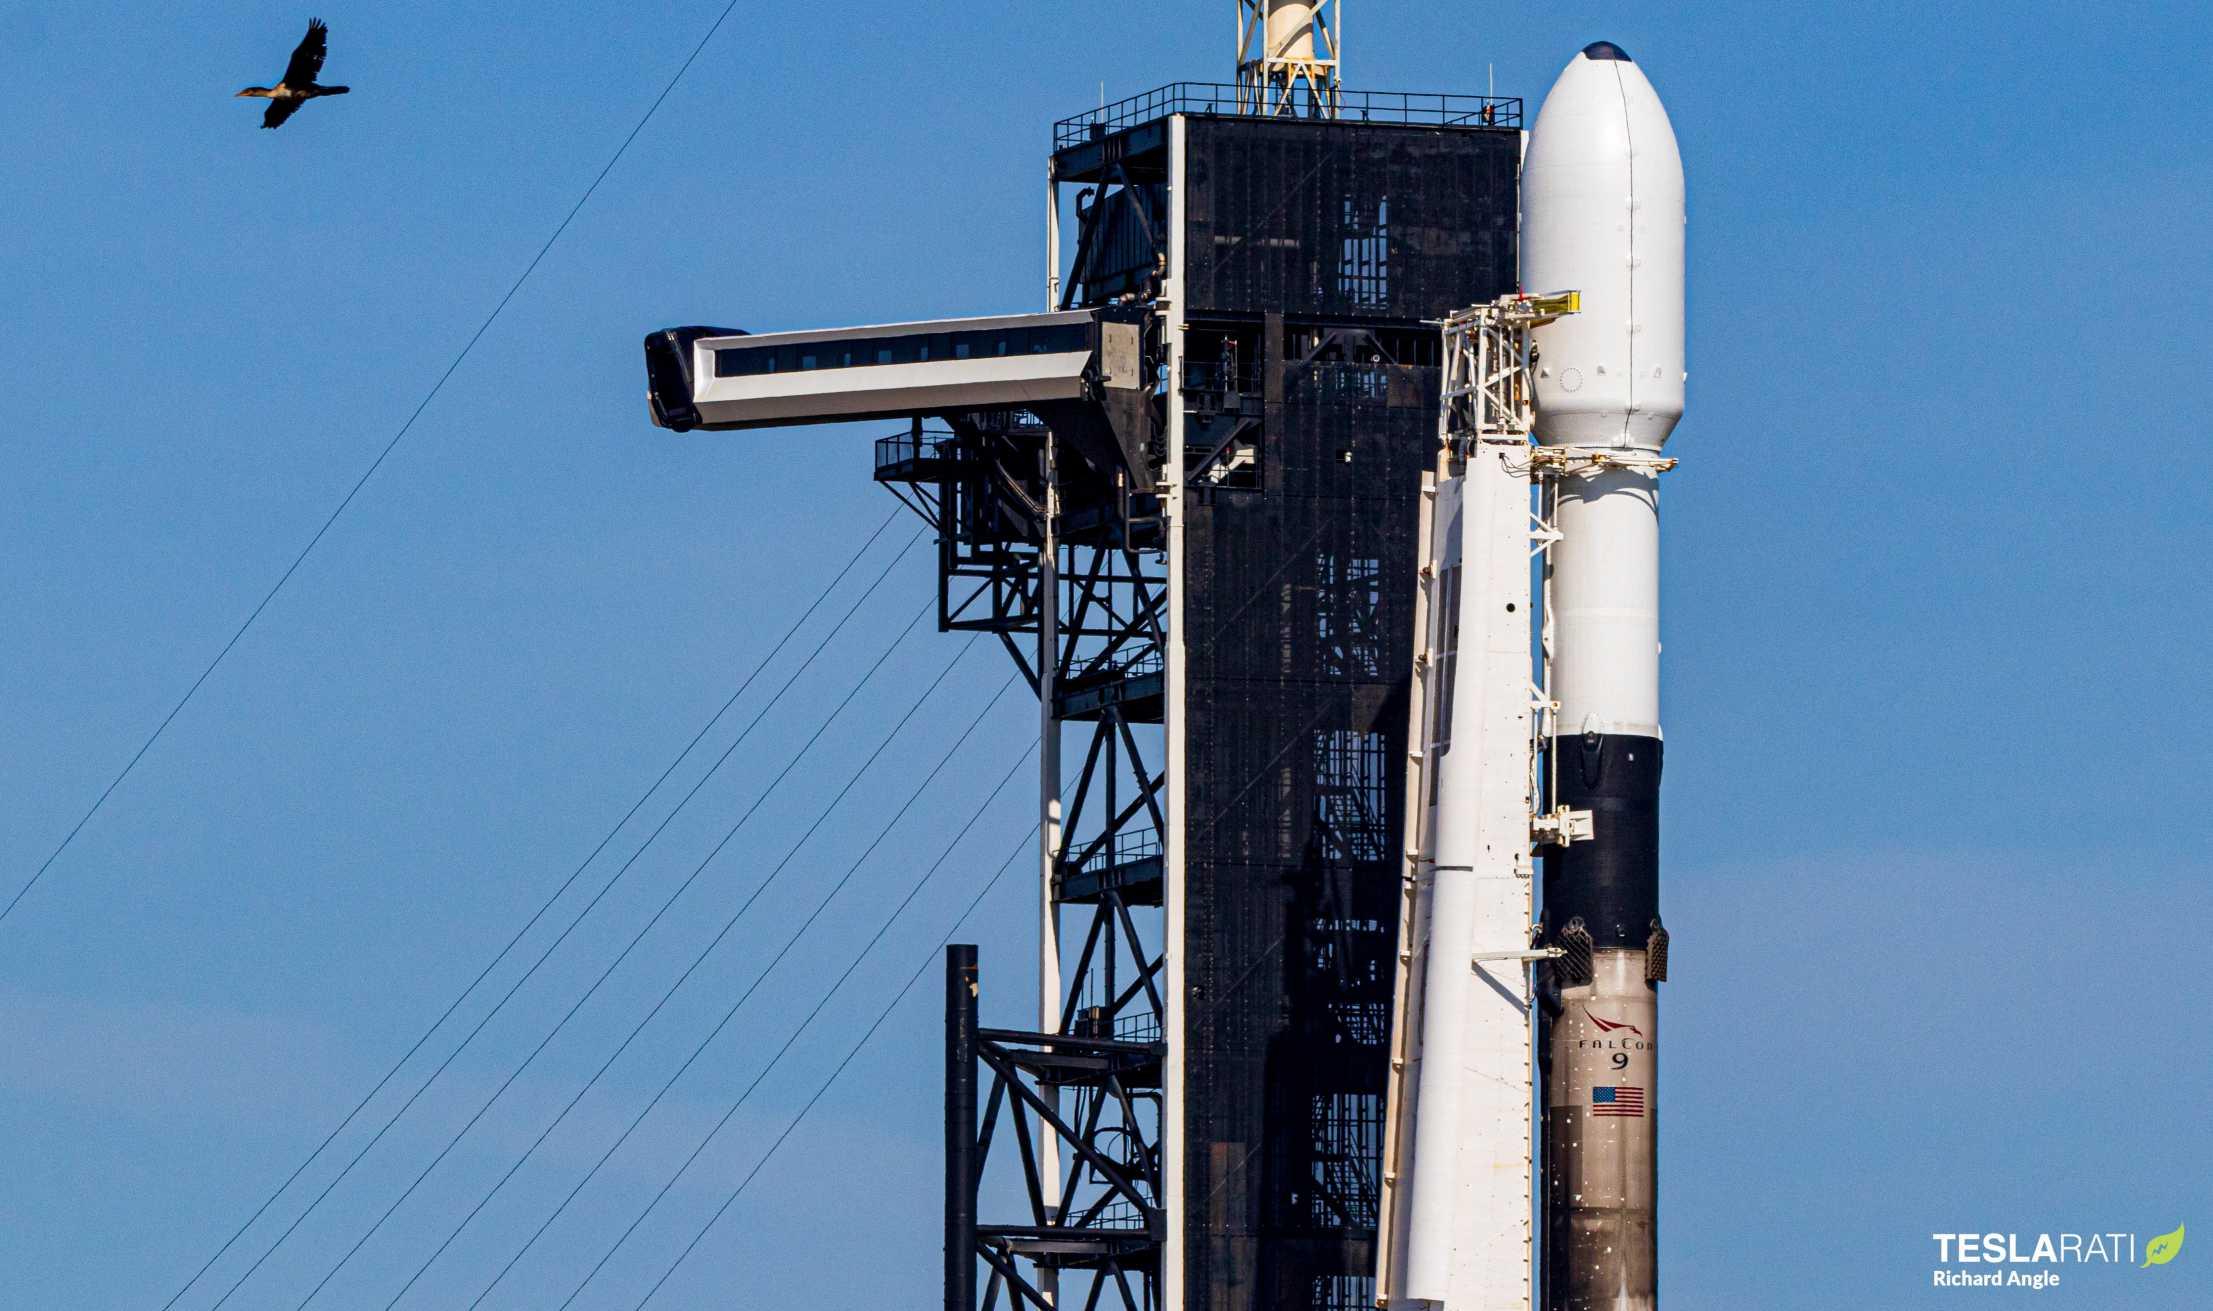 Falcon 9 Starlink 6 042120 (Richard Angle) prelaunch 1 (c)